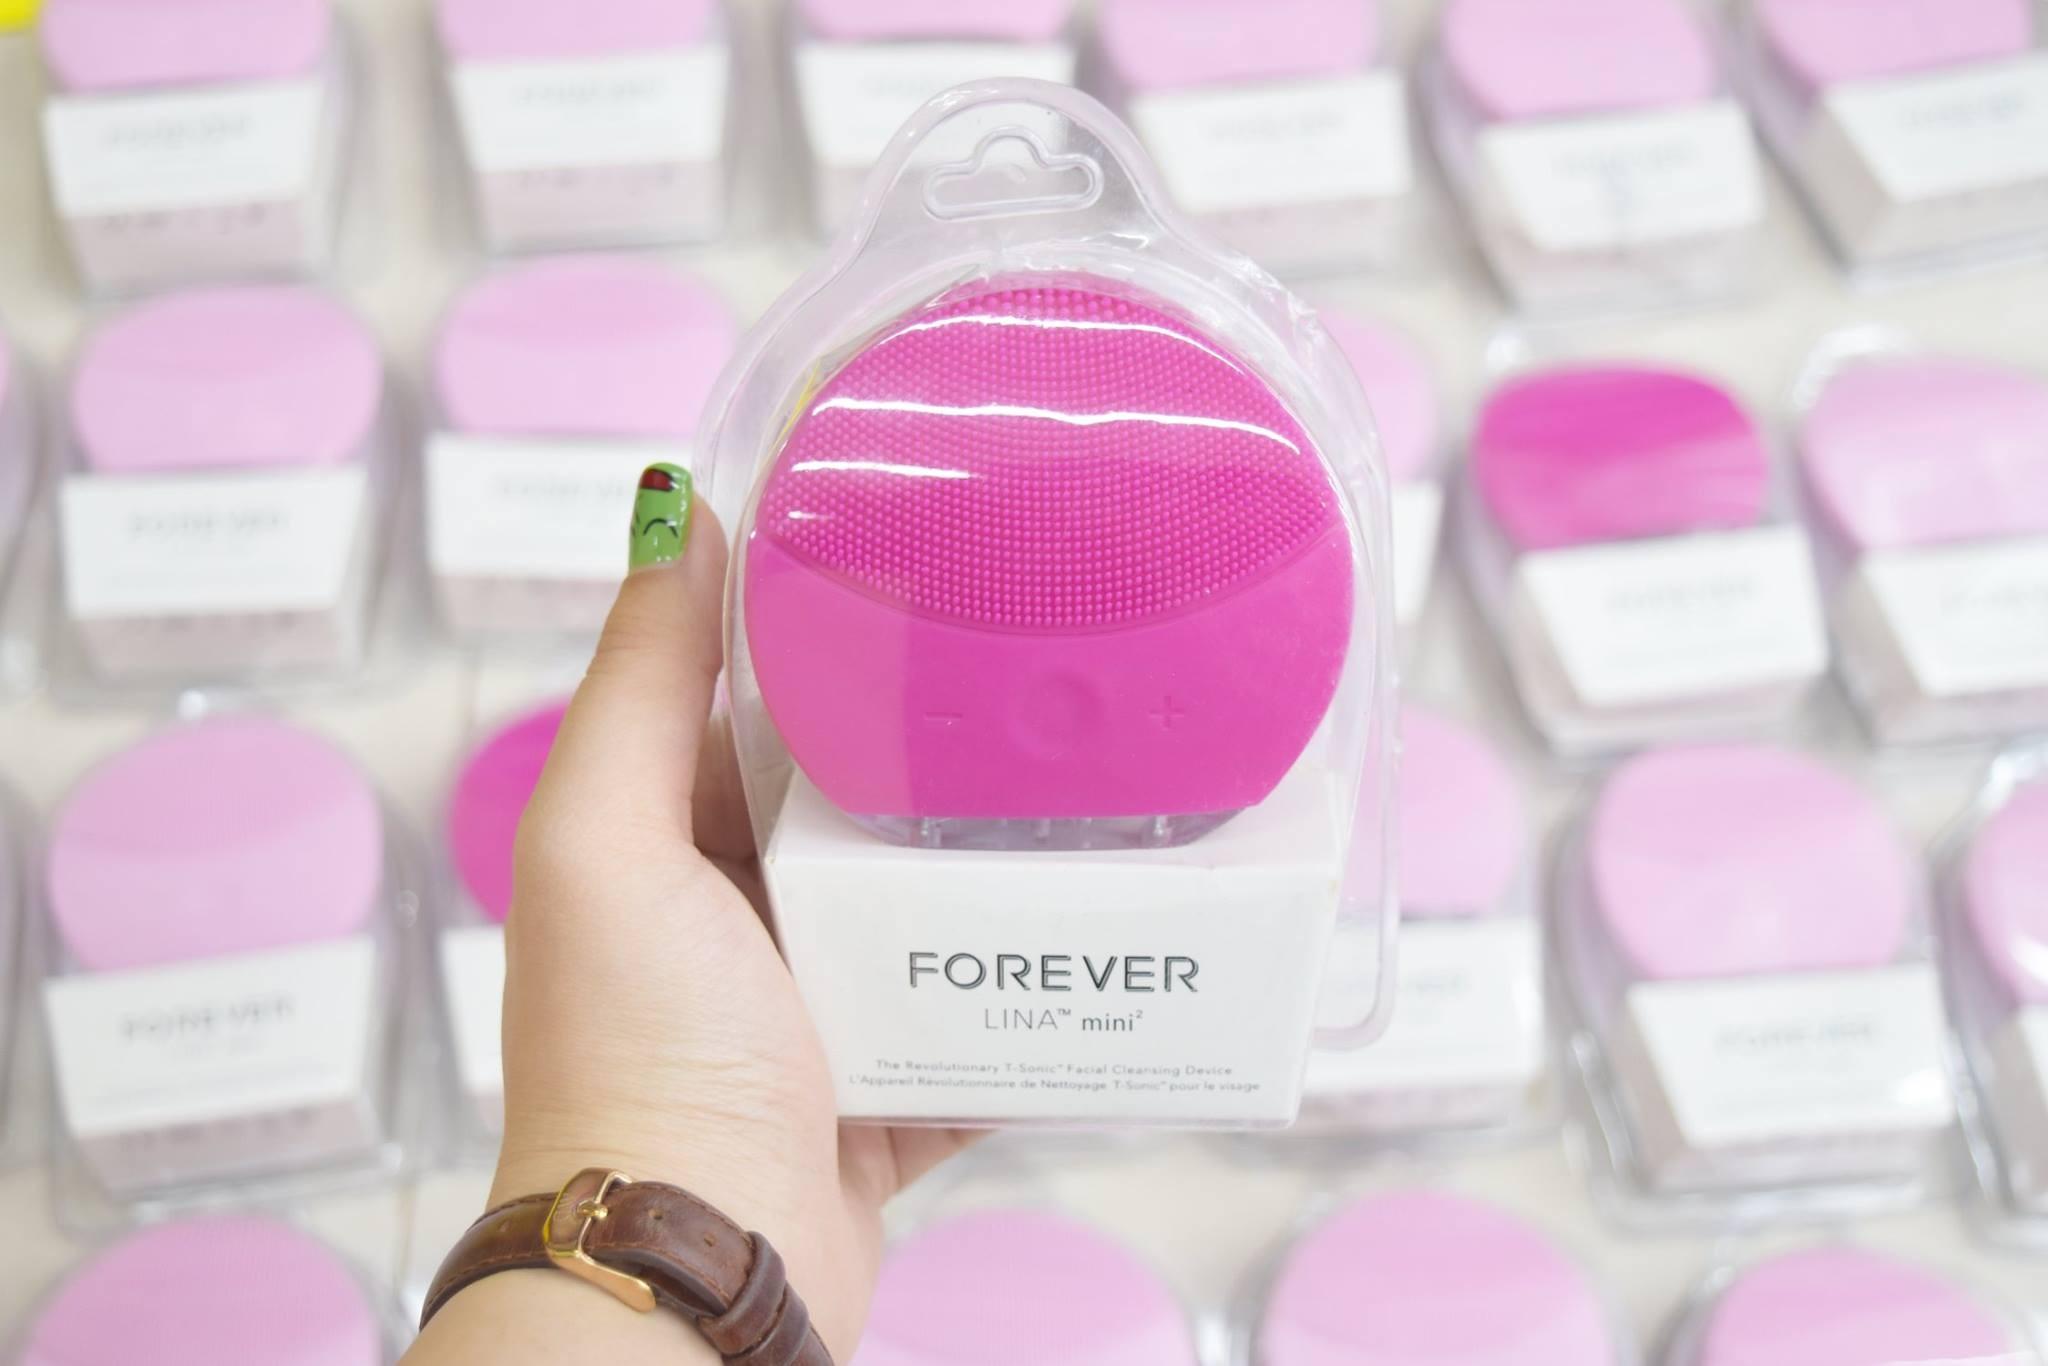 máy rửa mặt forever 1